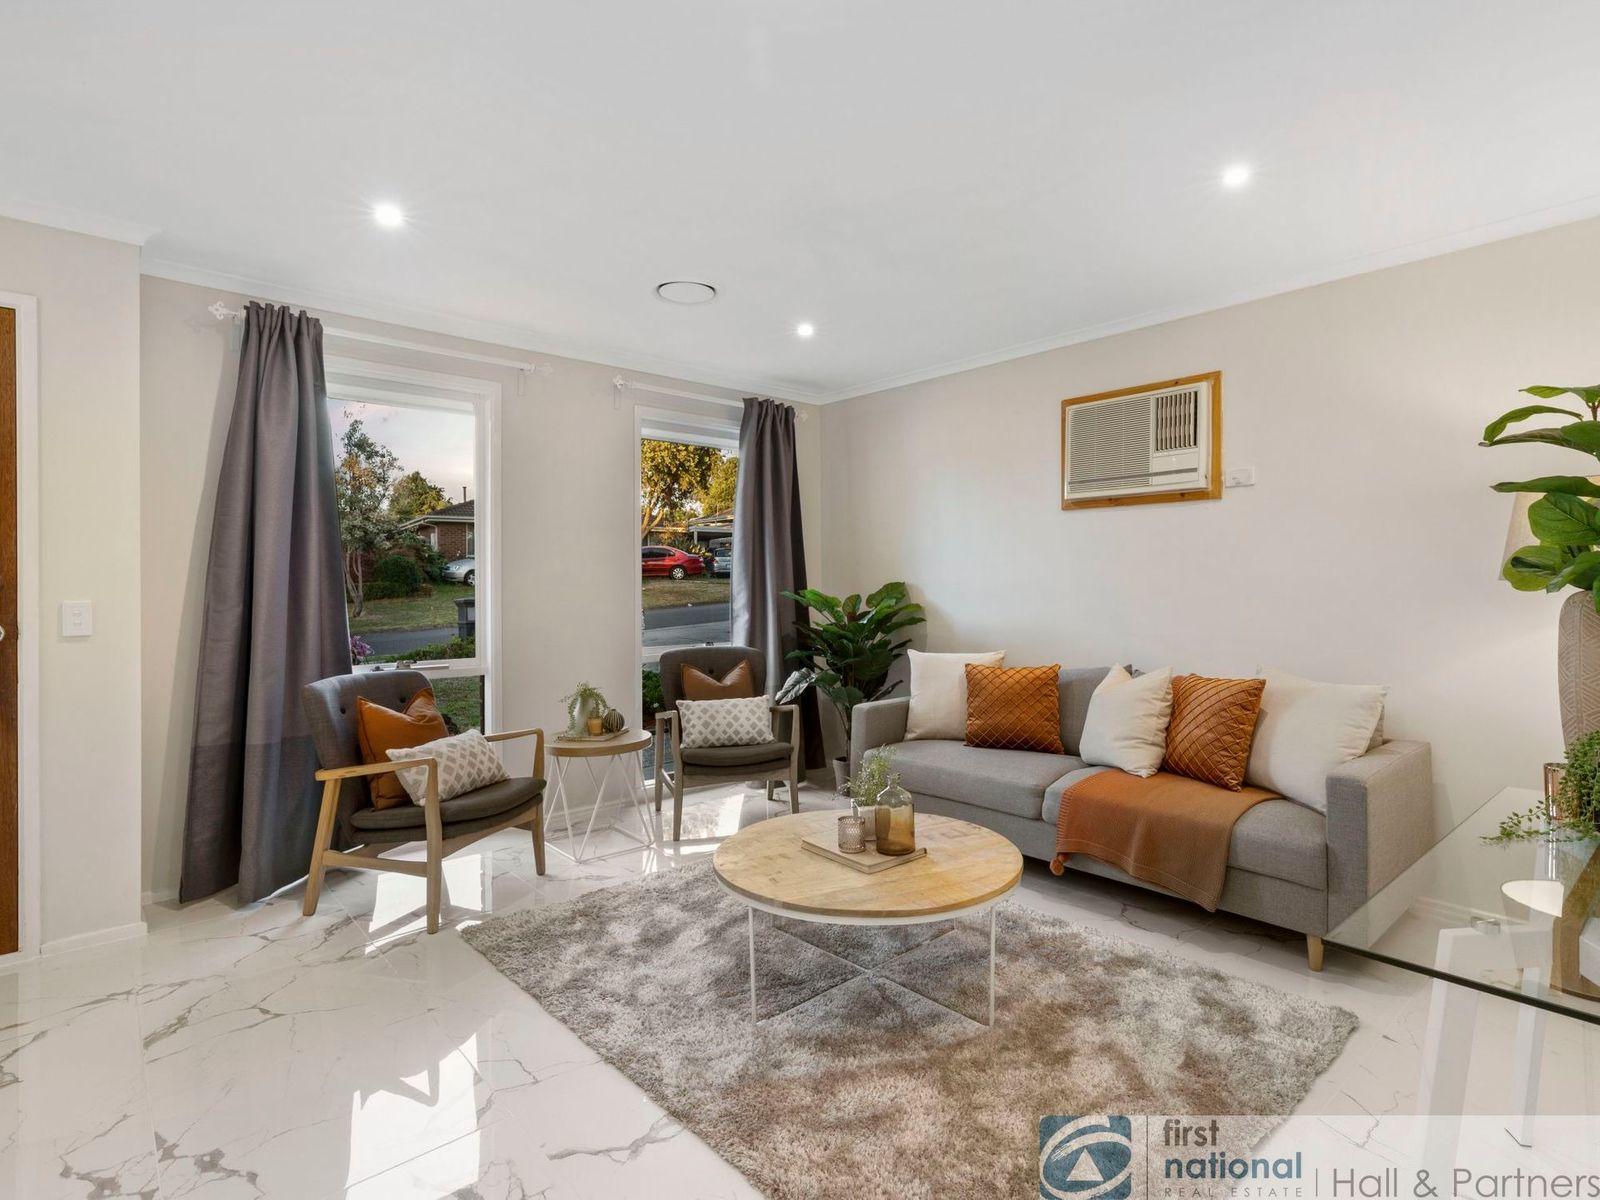 32 James Wyman Place, Hampton Park, VIC 3976